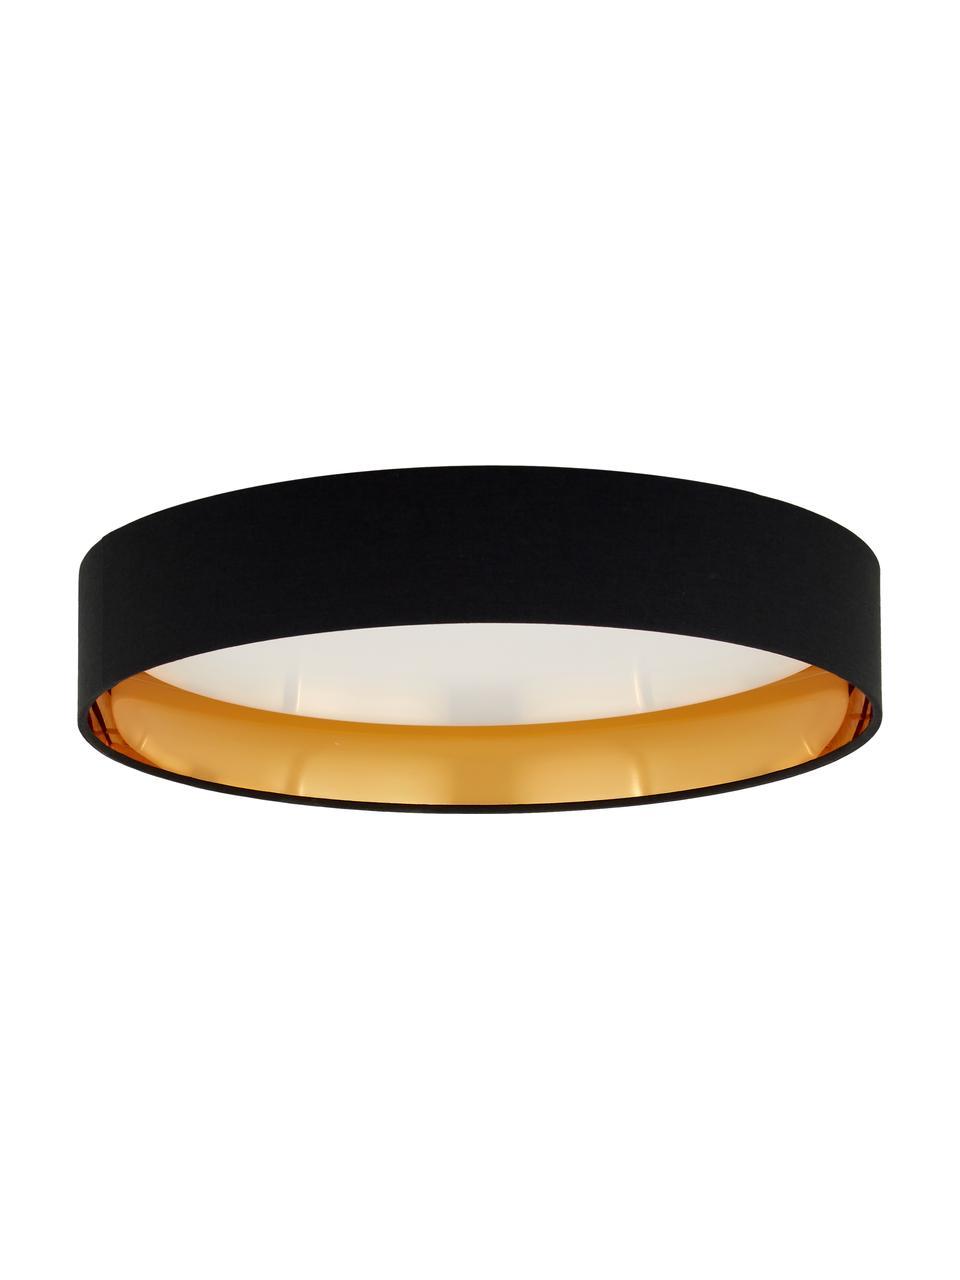 Plafoniera a LED nera Mallory, Cornice: metallo, Nero, Ø 41 x Alt. 10 cm